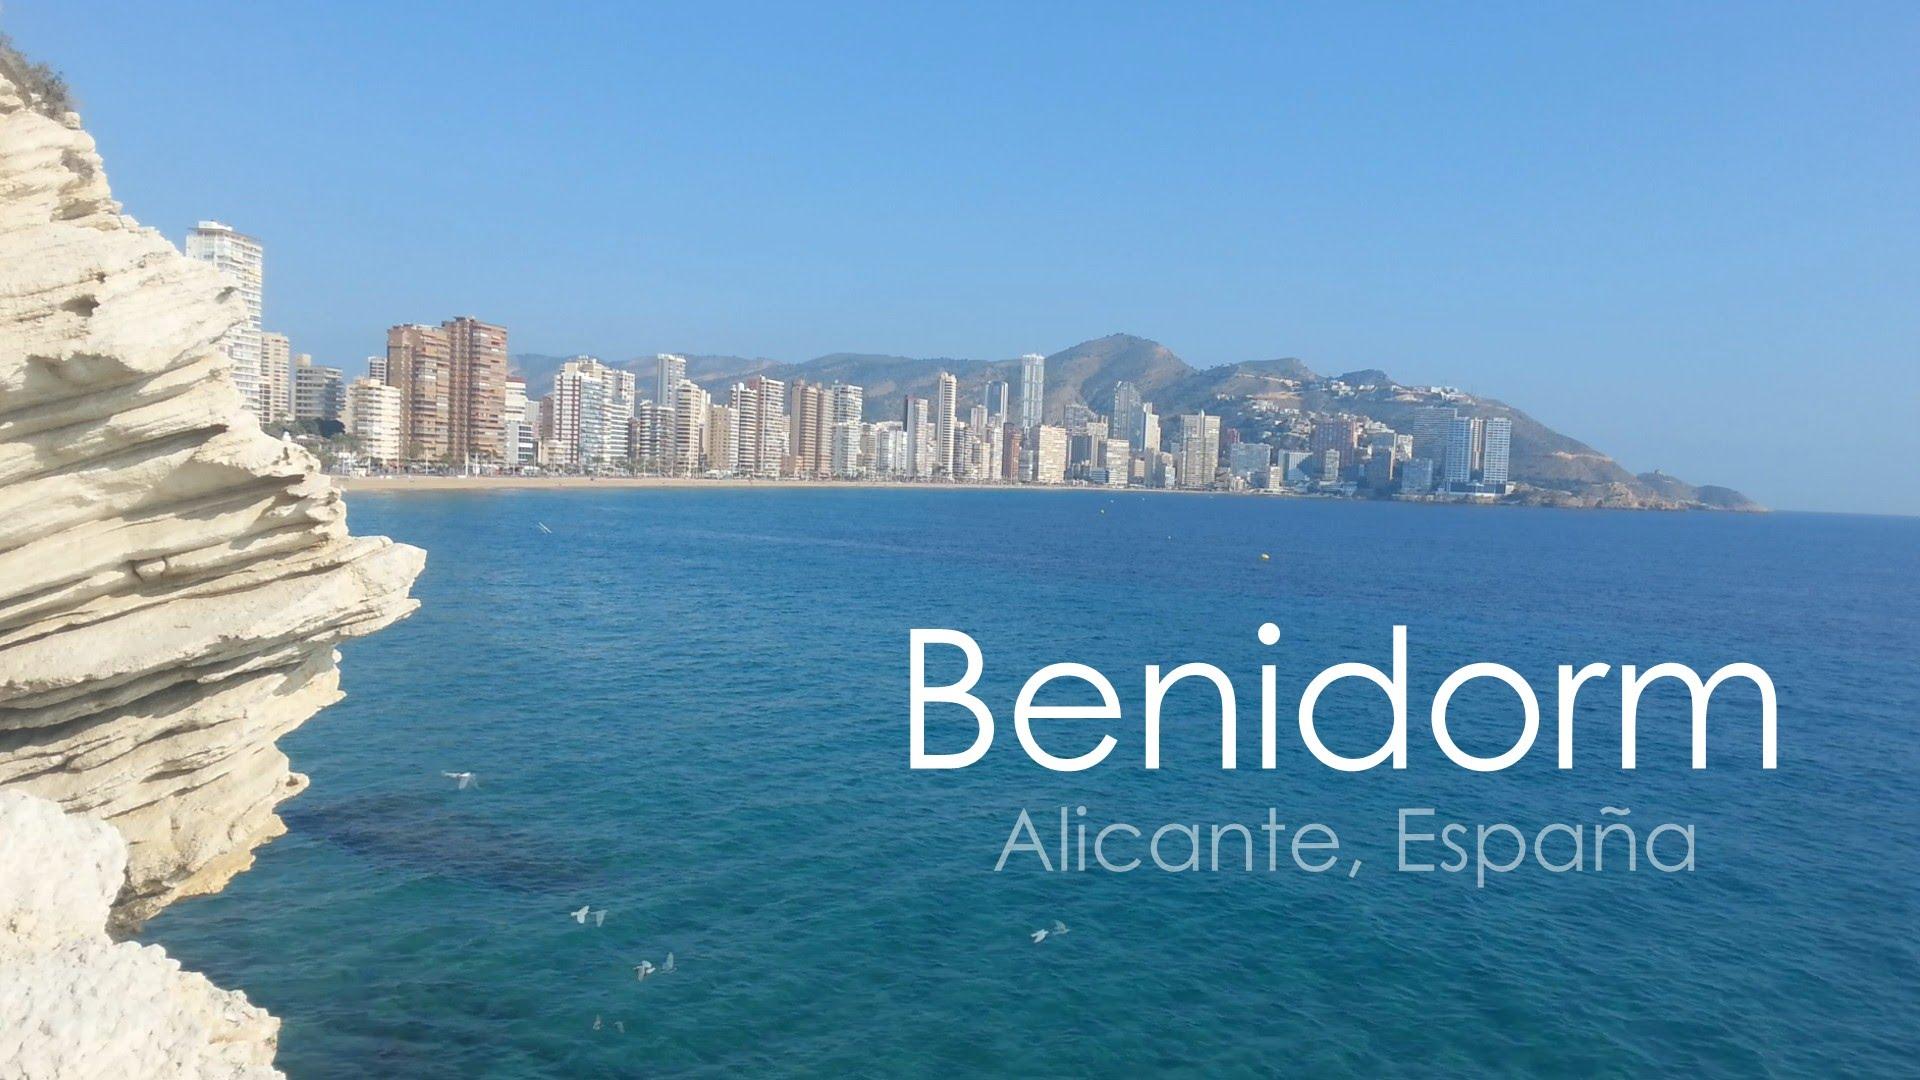 Reisetips Benidorm i Spania